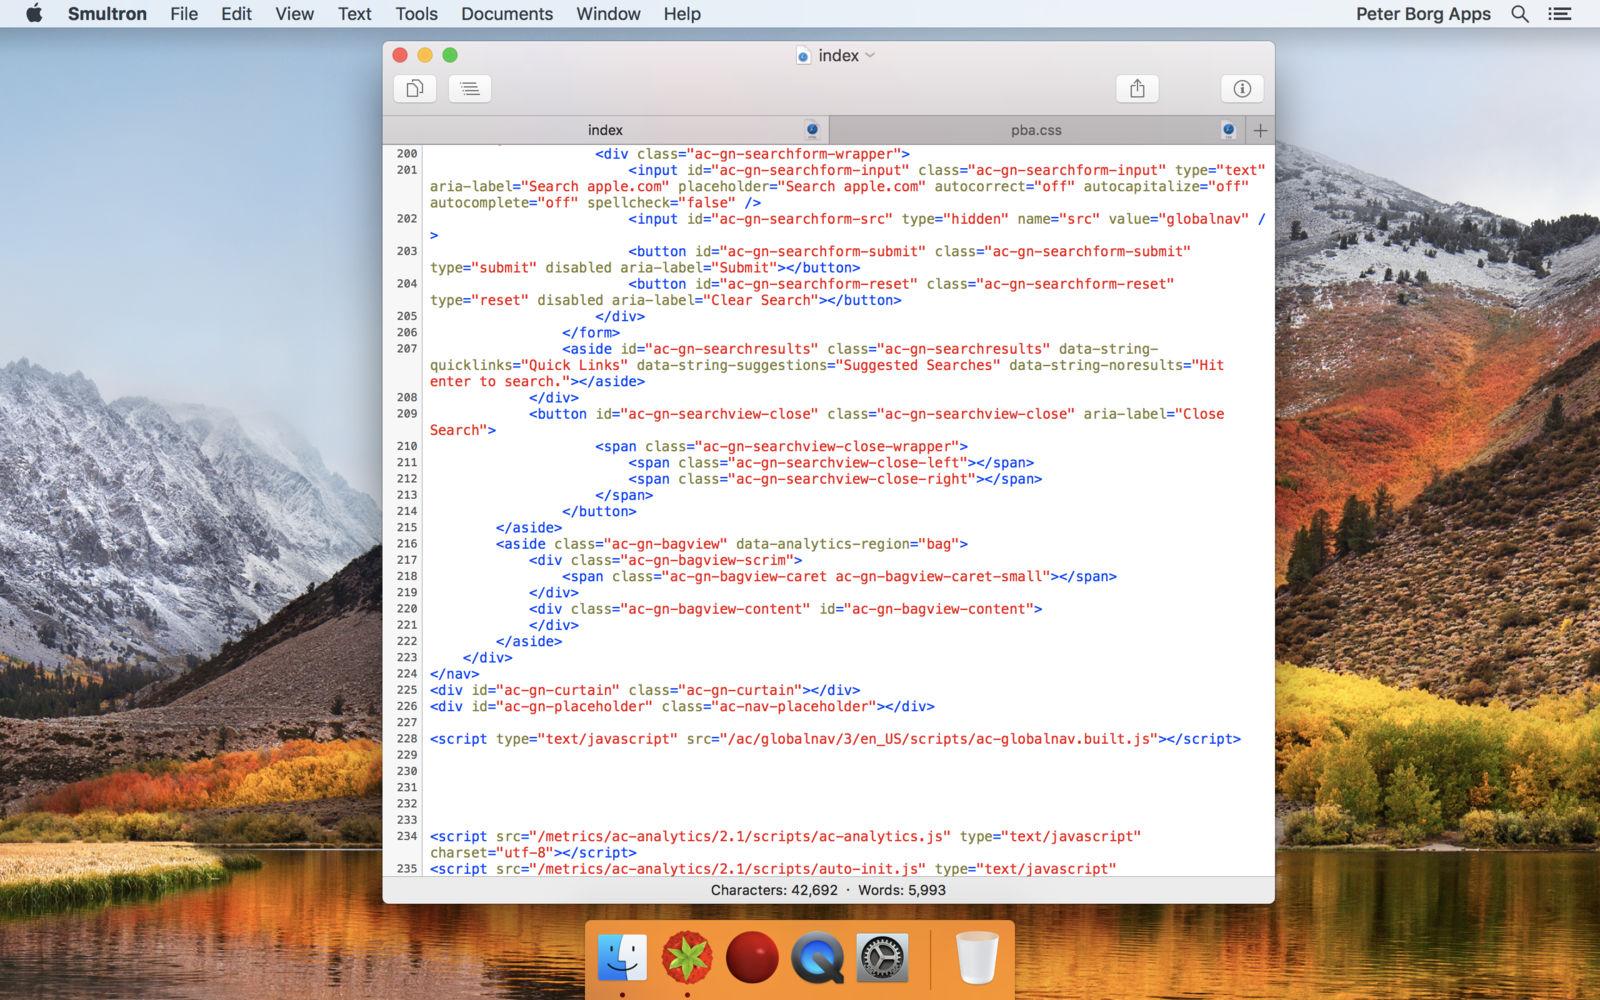 Smultron v11.2.4 一款优雅而强大的文本编辑器